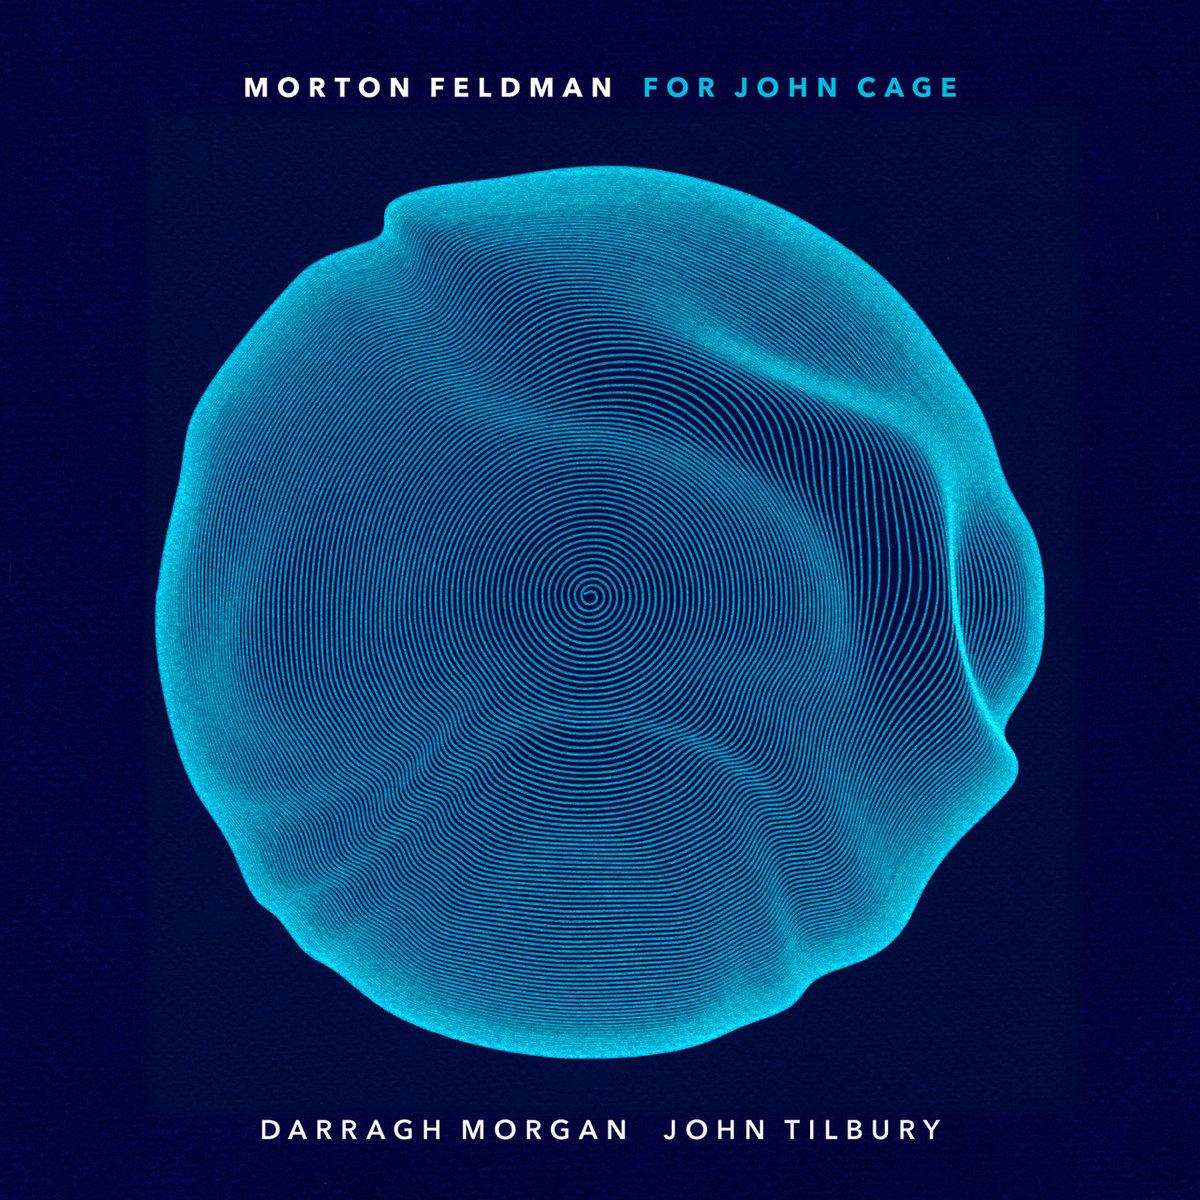 Morton Feldman - For John Cage | Diatribe Records